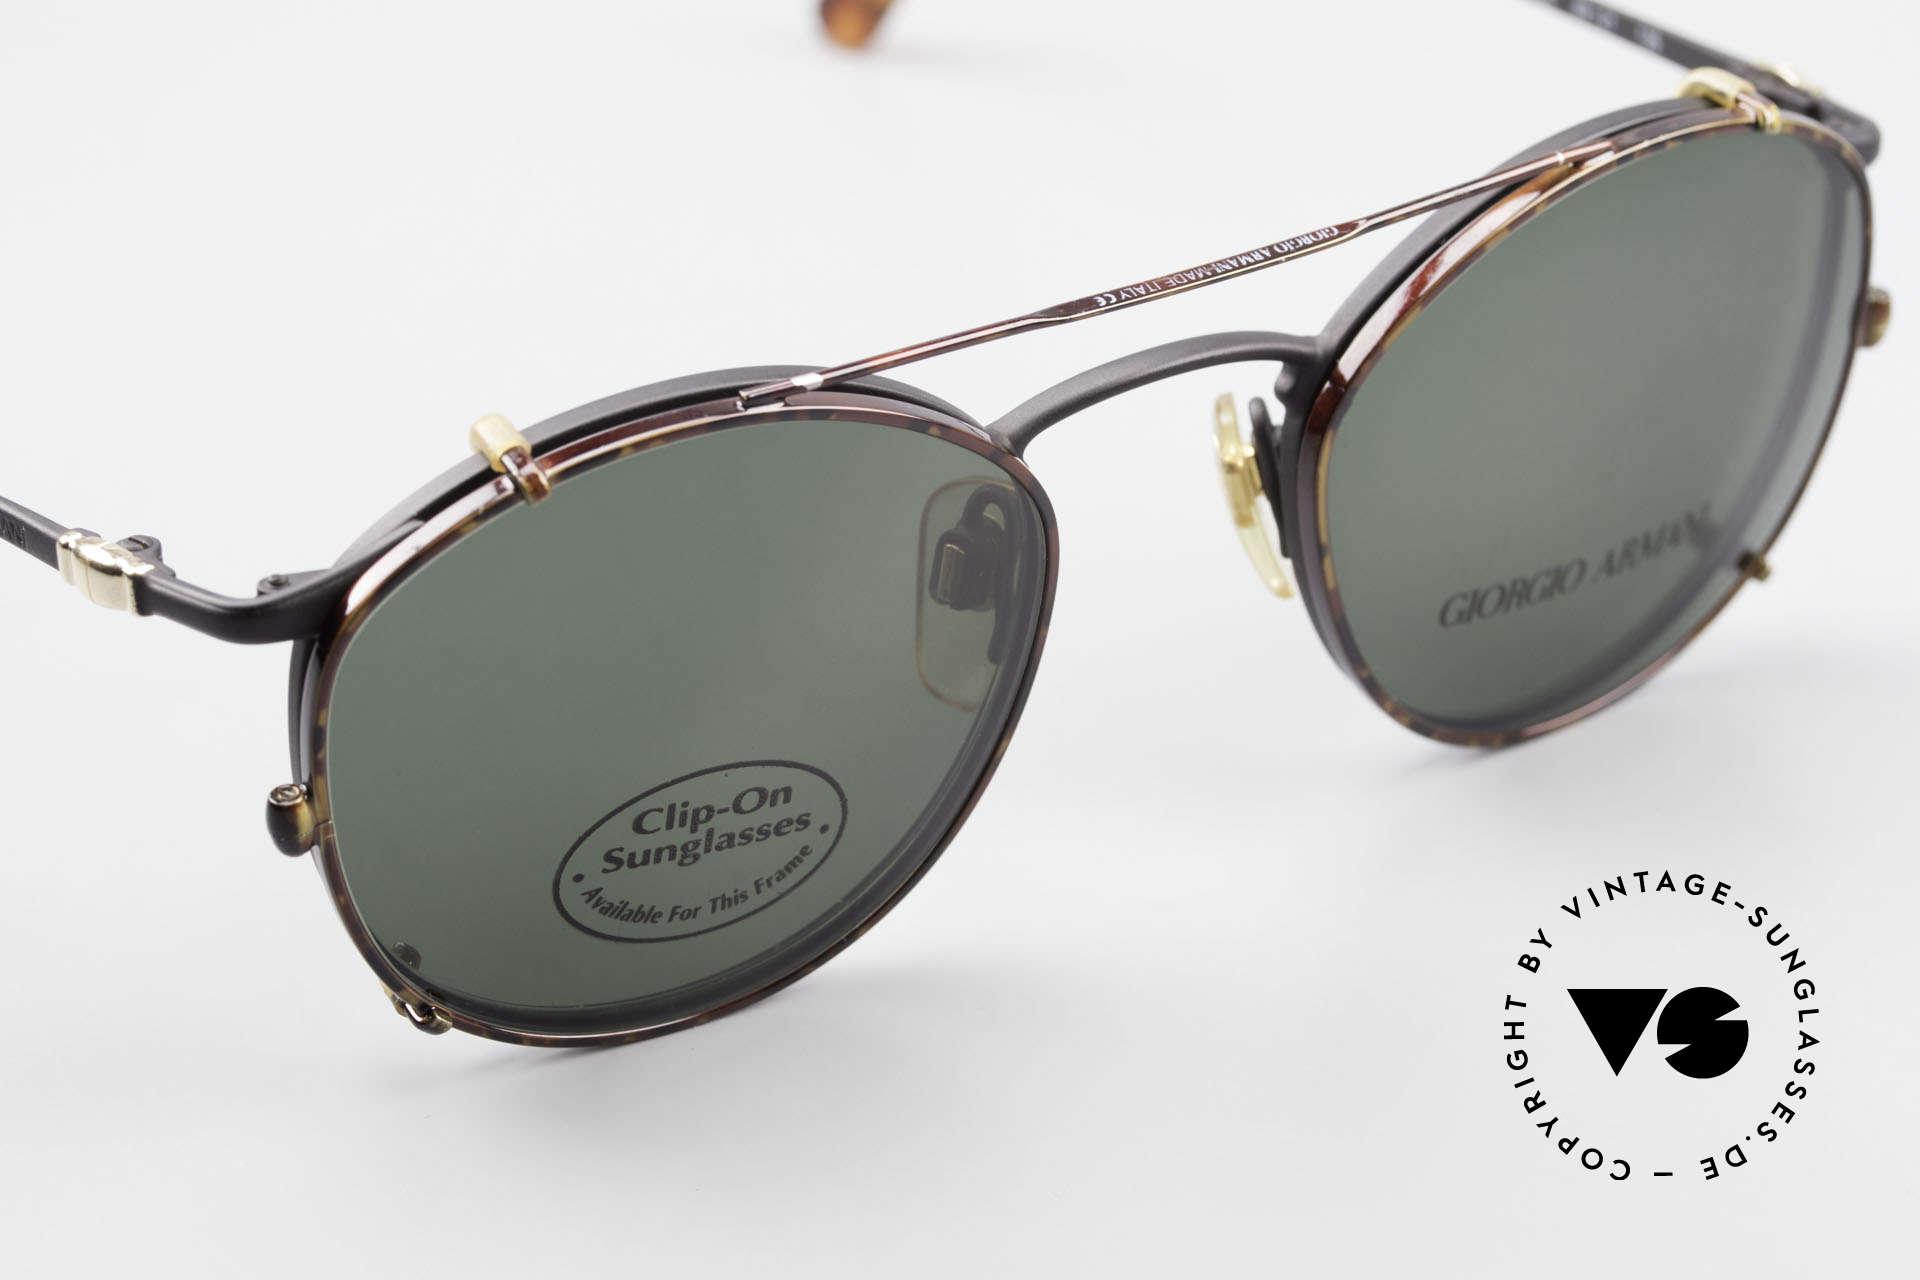 Giorgio Armani 132 Clip On Panto Eyeglasses 90's, unworn (like all our vintage GIORGIO Armani frames), Made for Men